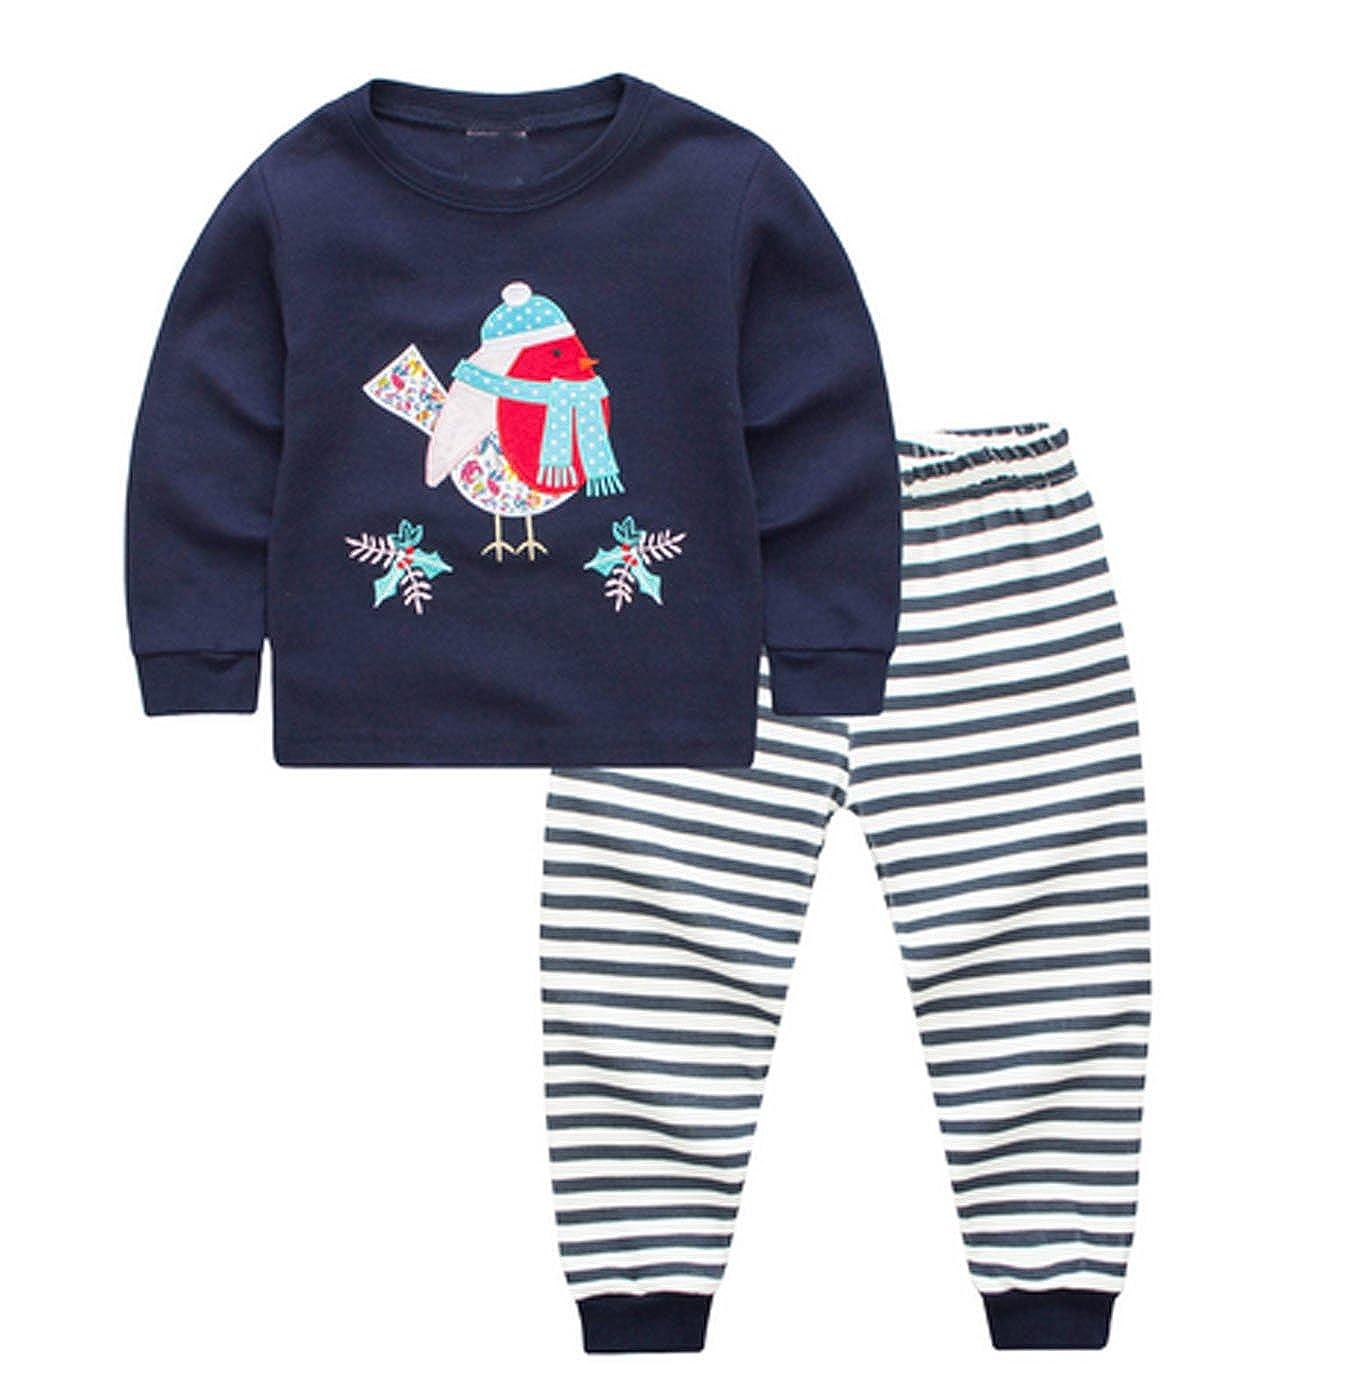 Mengmeng Boy Pajamas 100/% Cotton Dinosaur Toddler Pjs Sleepwear Kids Clothes Pant Set